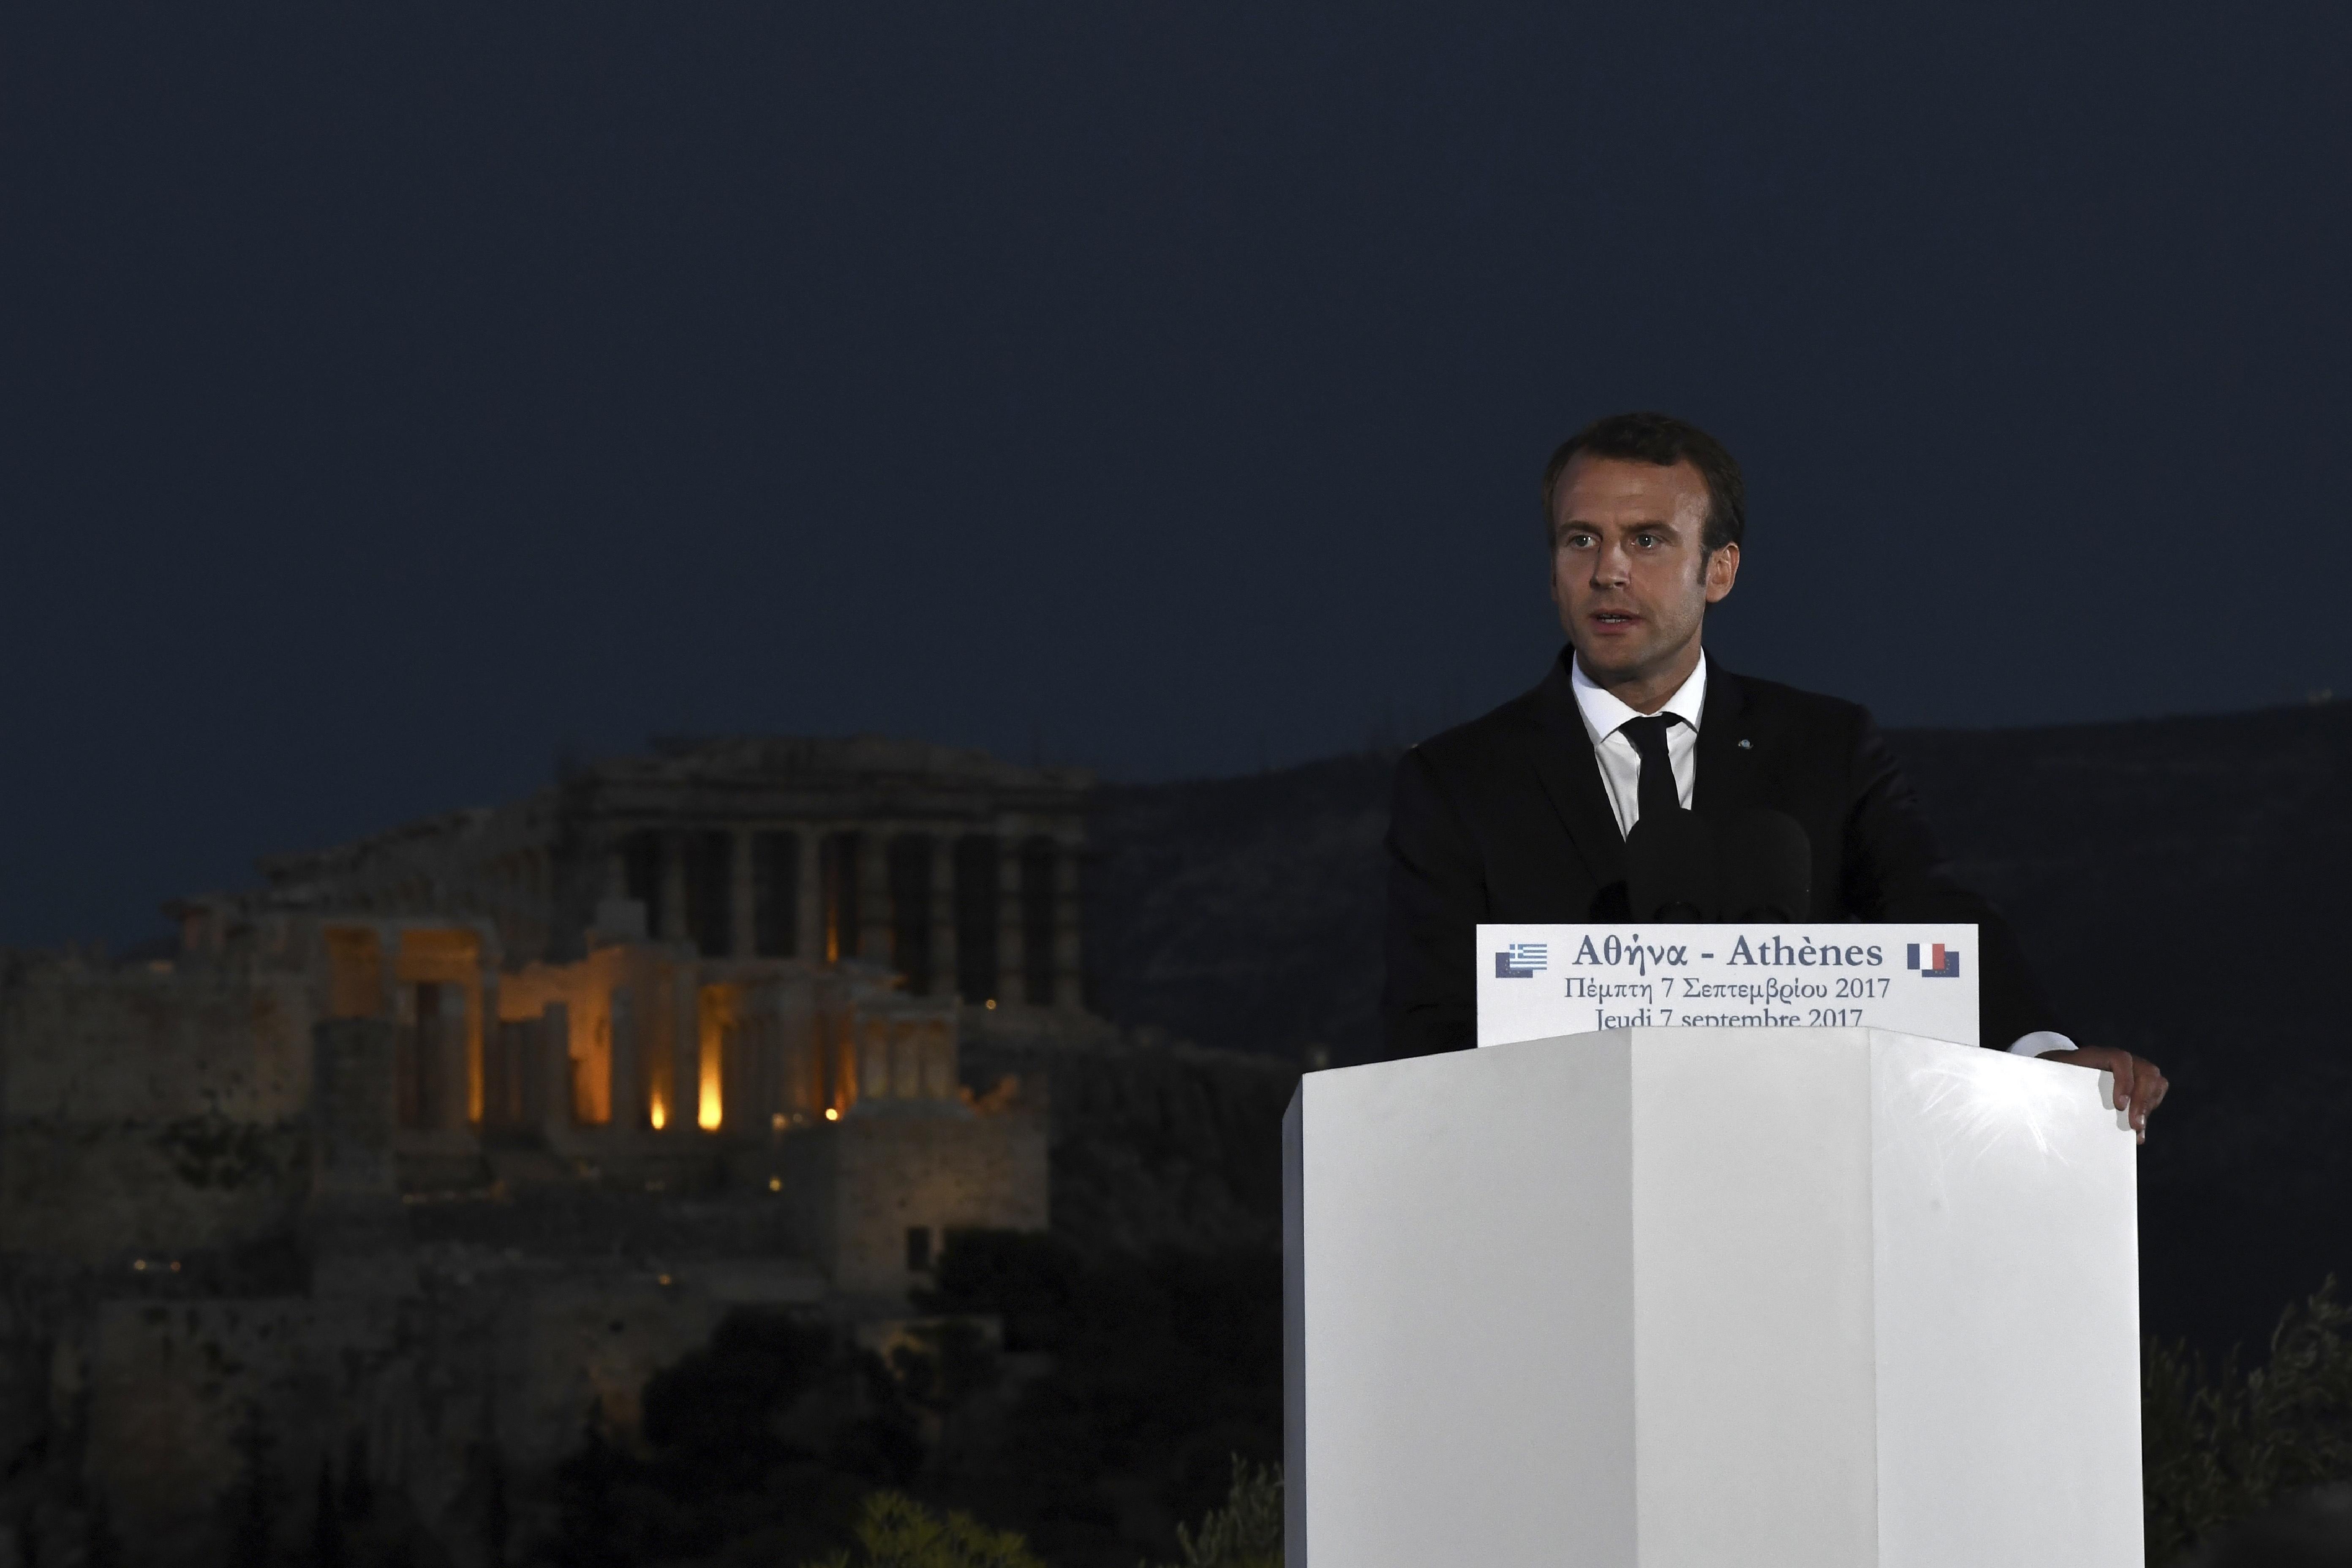 Макрон: Европа рискува да стане подвластна на Китай и САЩ